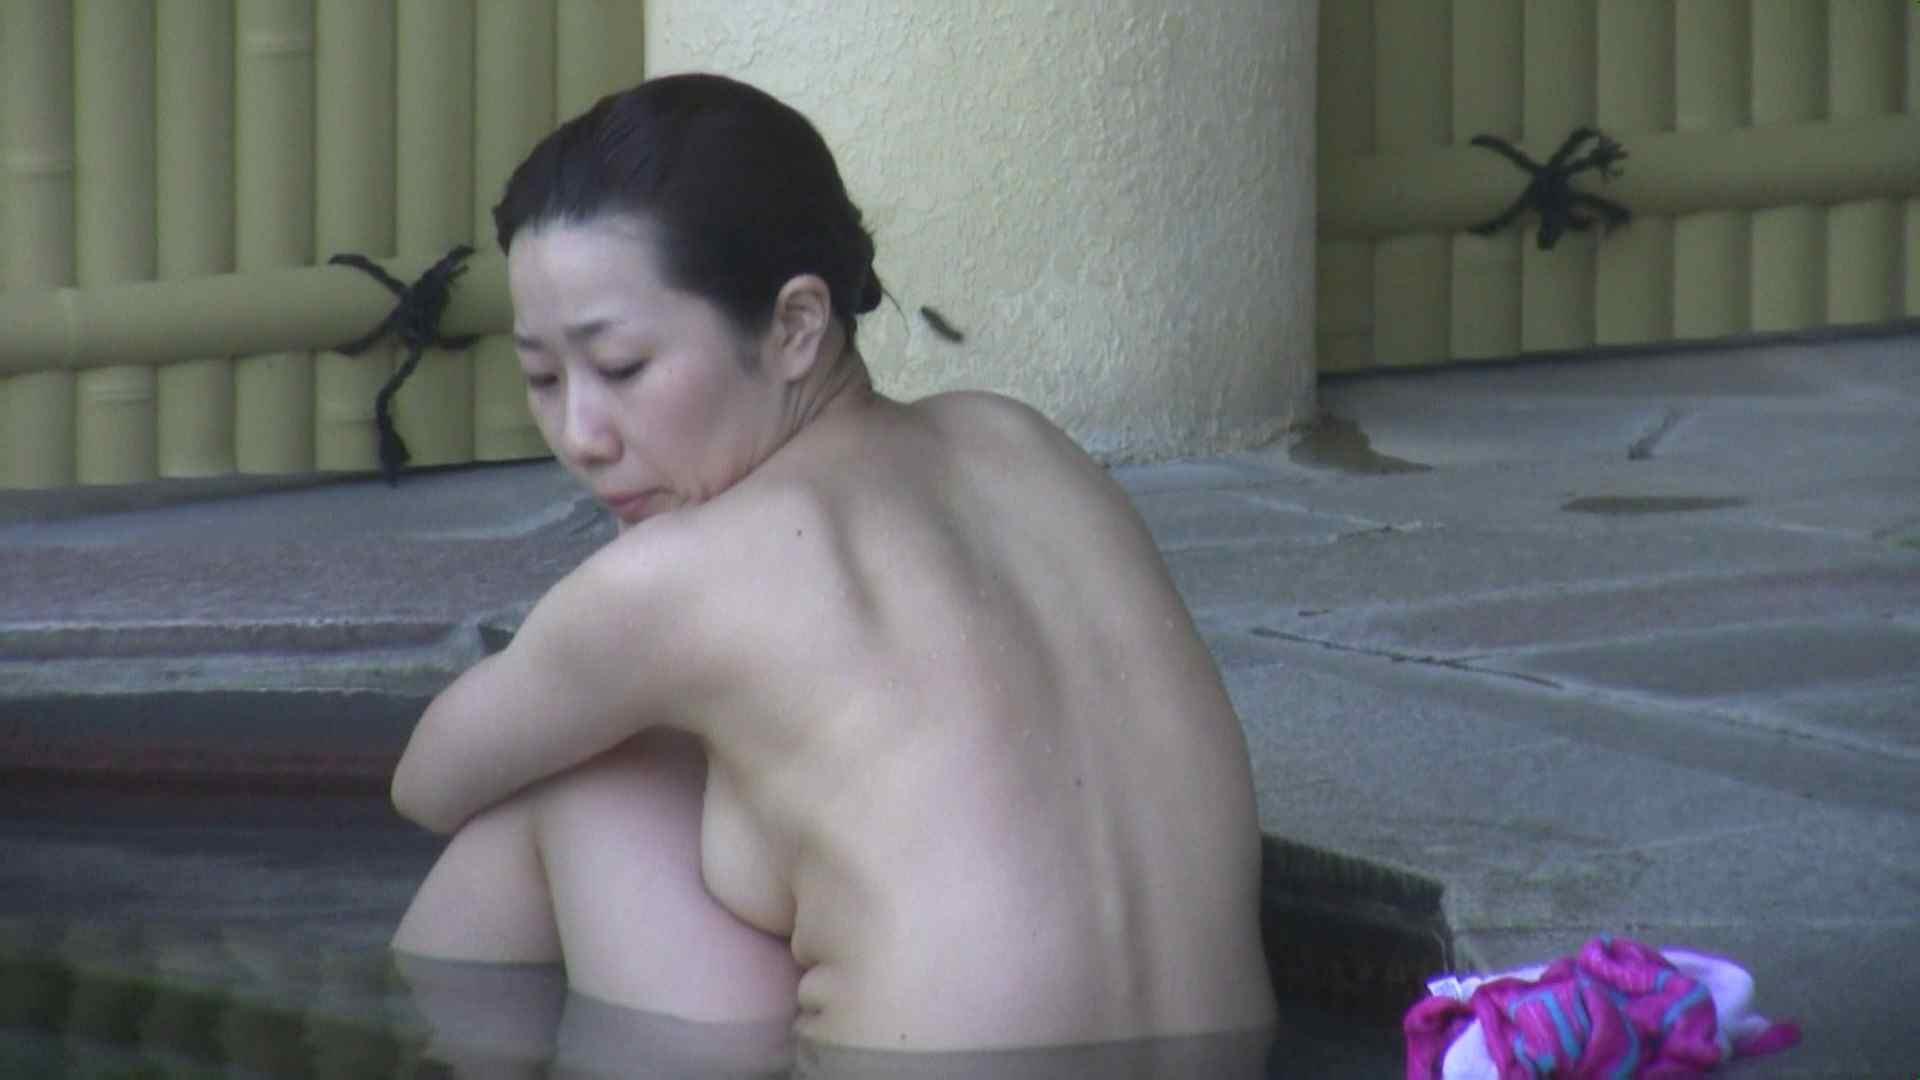 Aquaな露天風呂Vol.88【VIP限定】 綺麗なOLたち | 盗撮  57枚 7